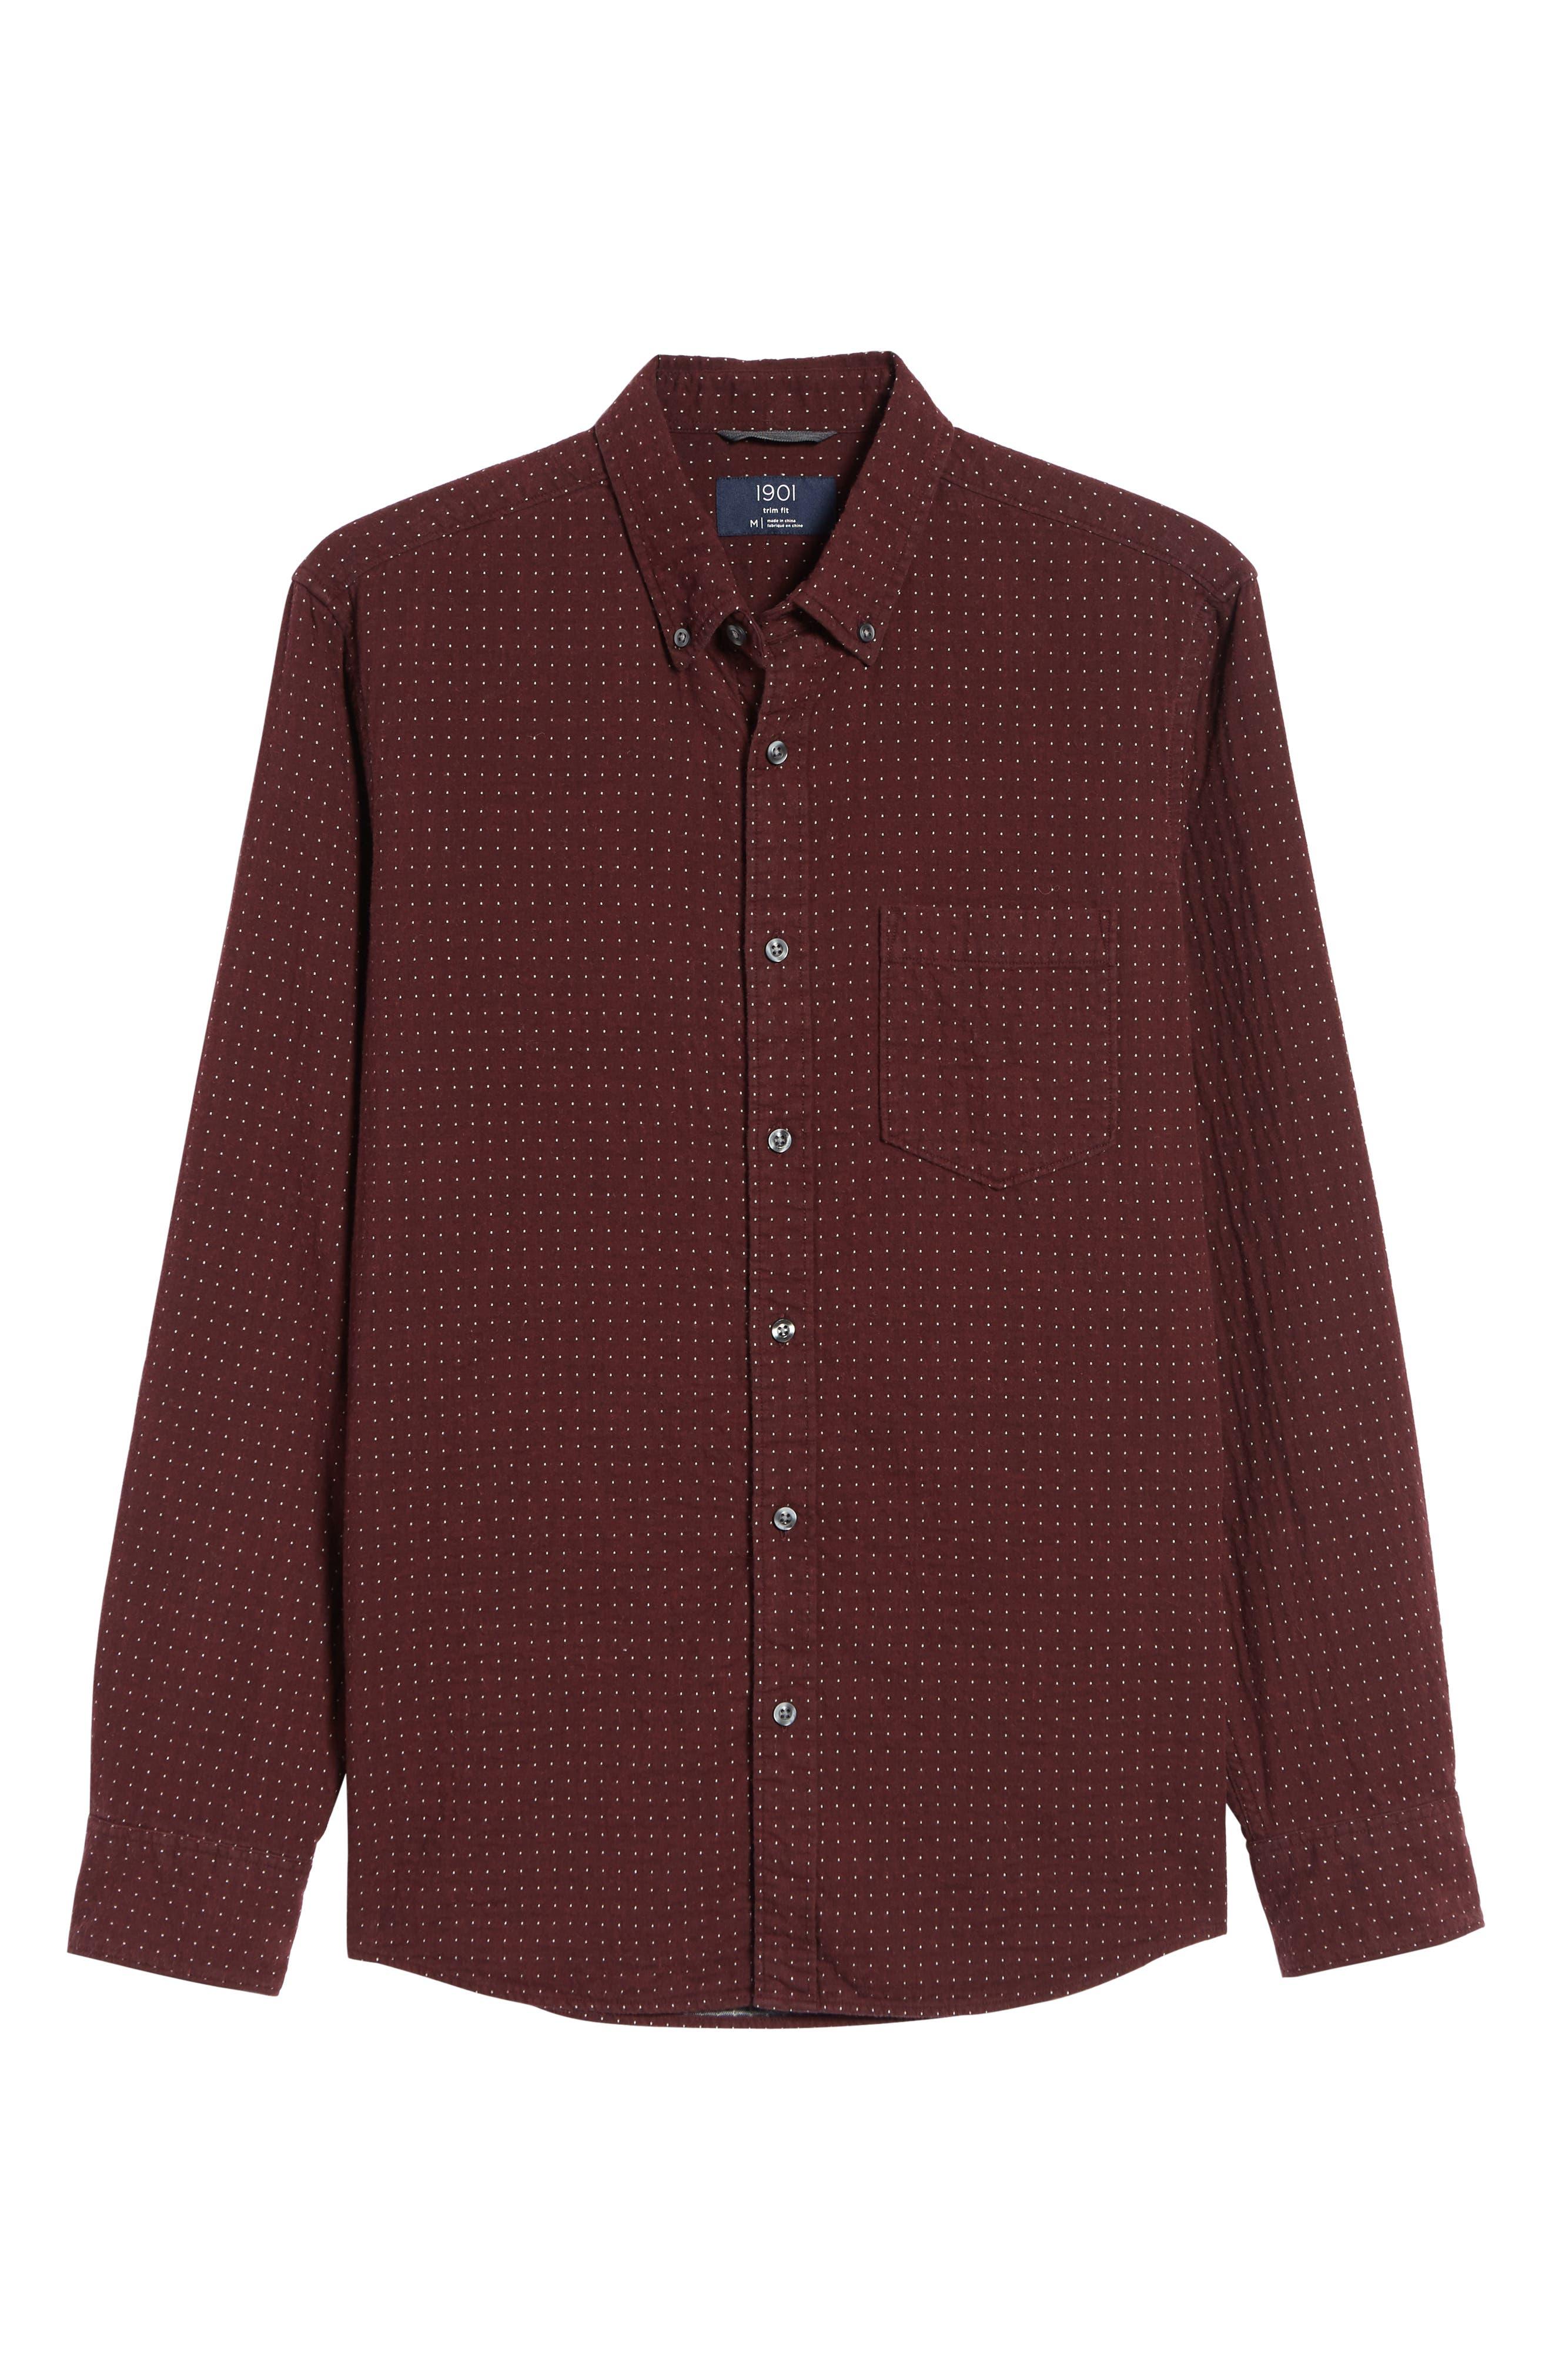 Trim Fit Dot Flannel Sport Shirt,                             Alternate thumbnail 5, color,                             BURGUNDY ROYALE GREY DUOFOLD